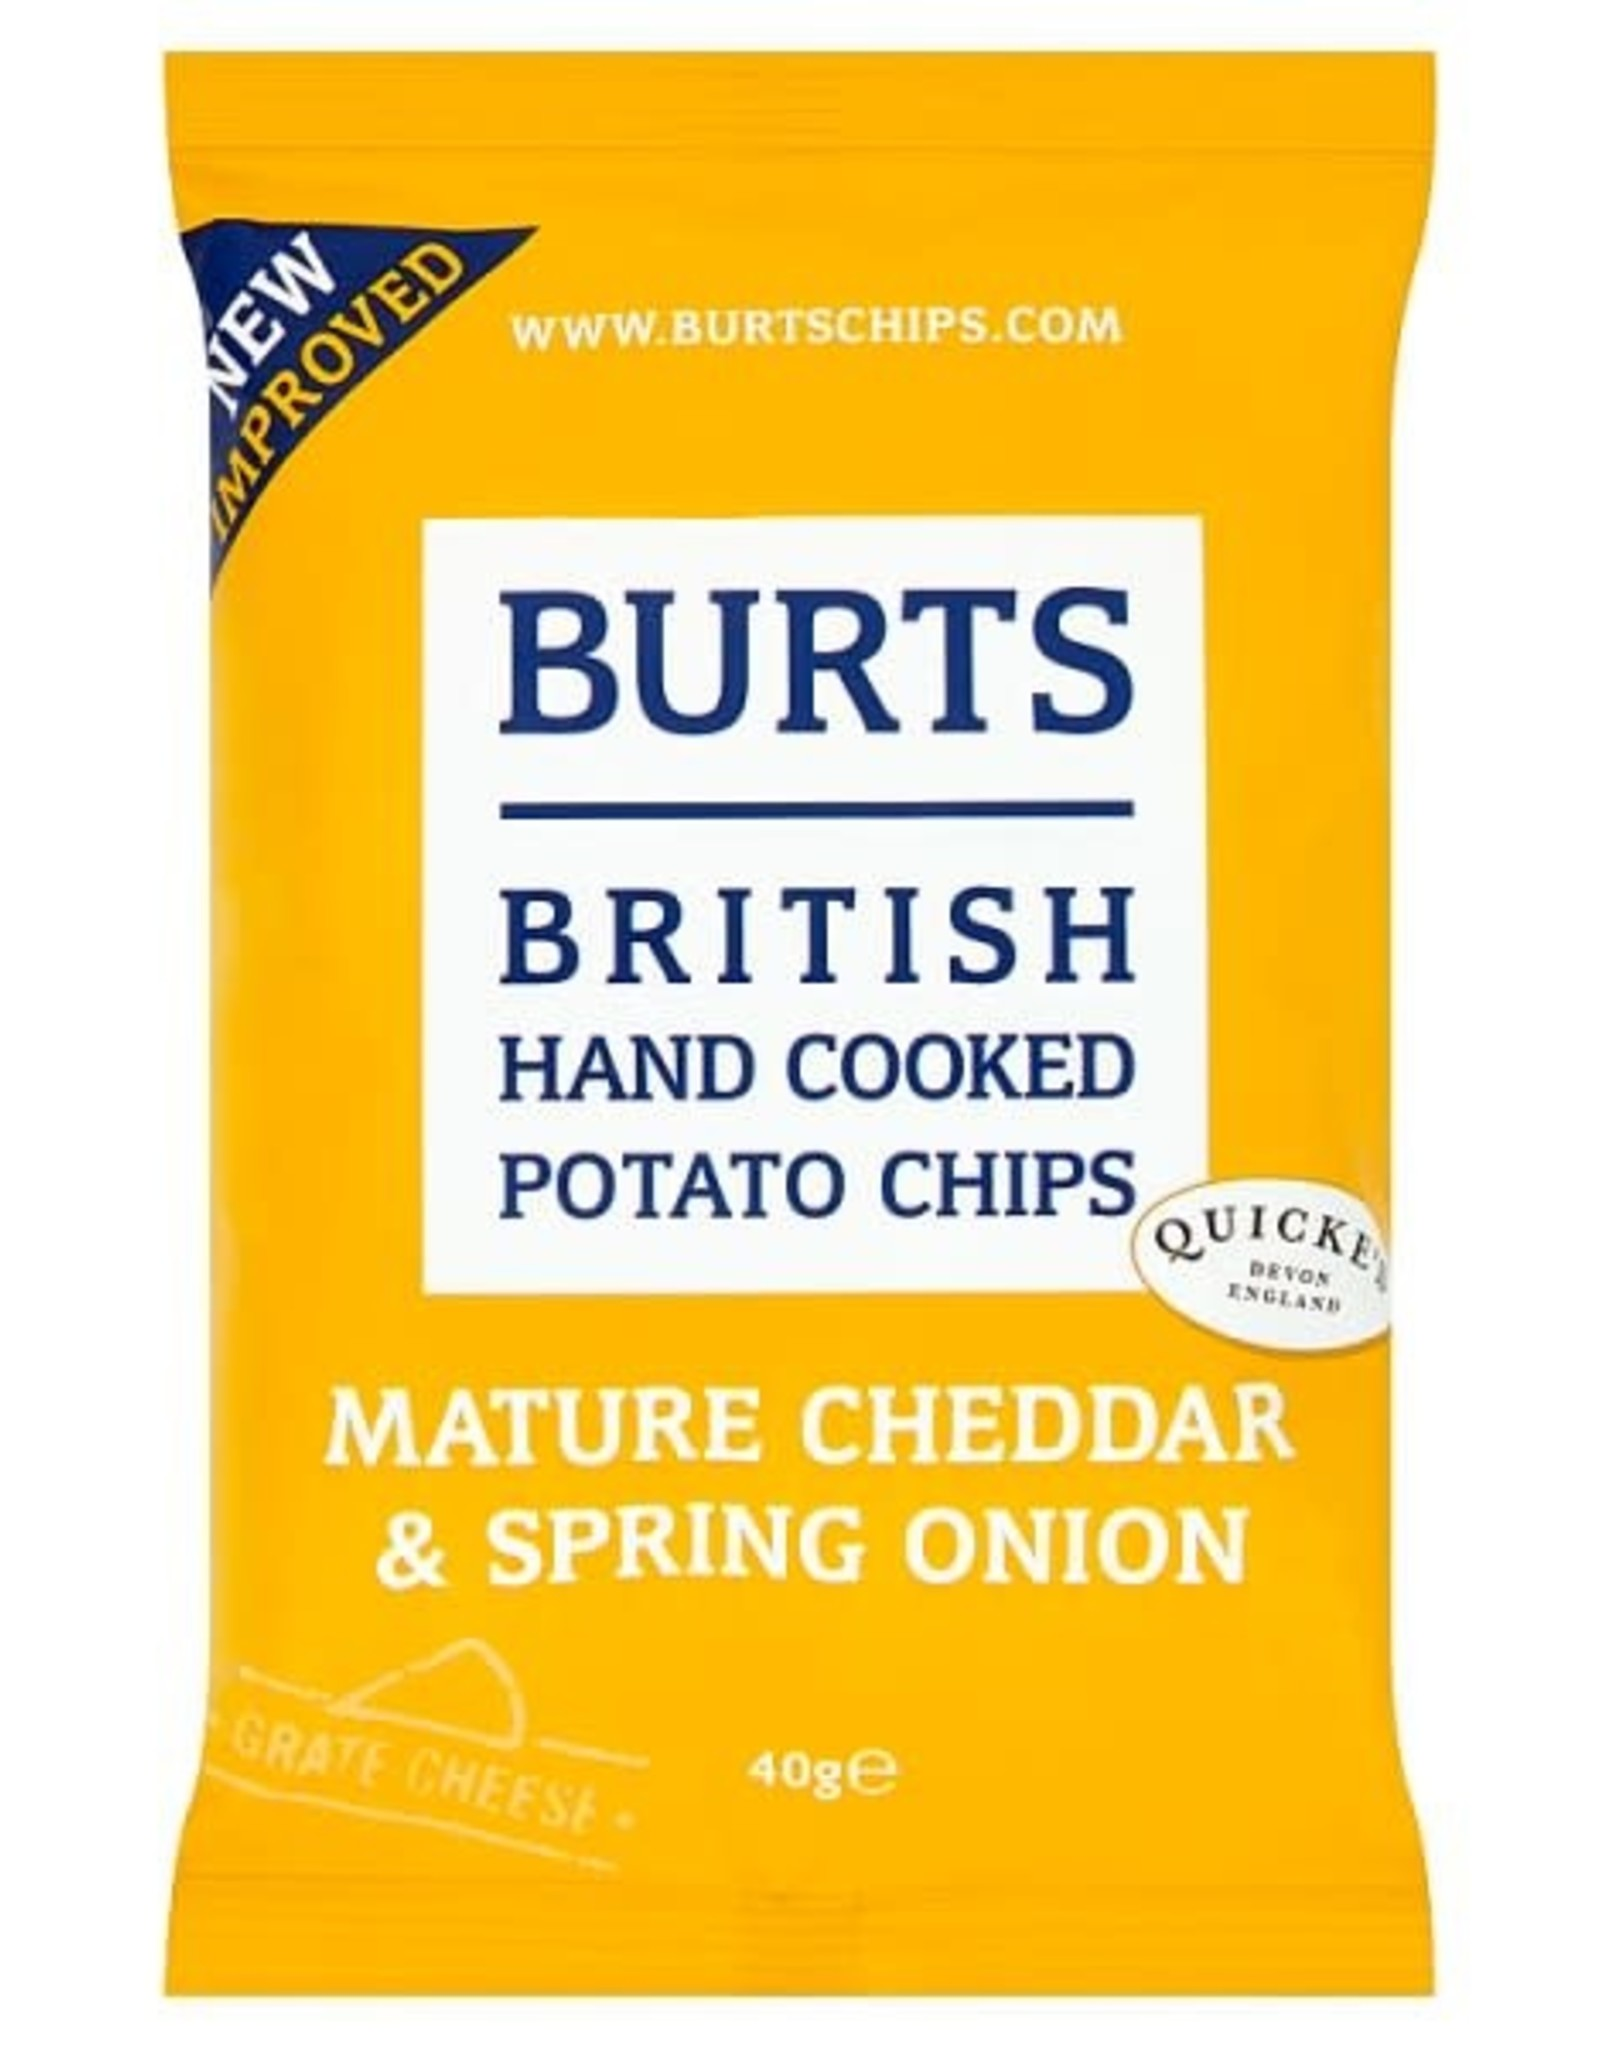 Burts Burts Matture Cheddar & Spring Onion 40 g